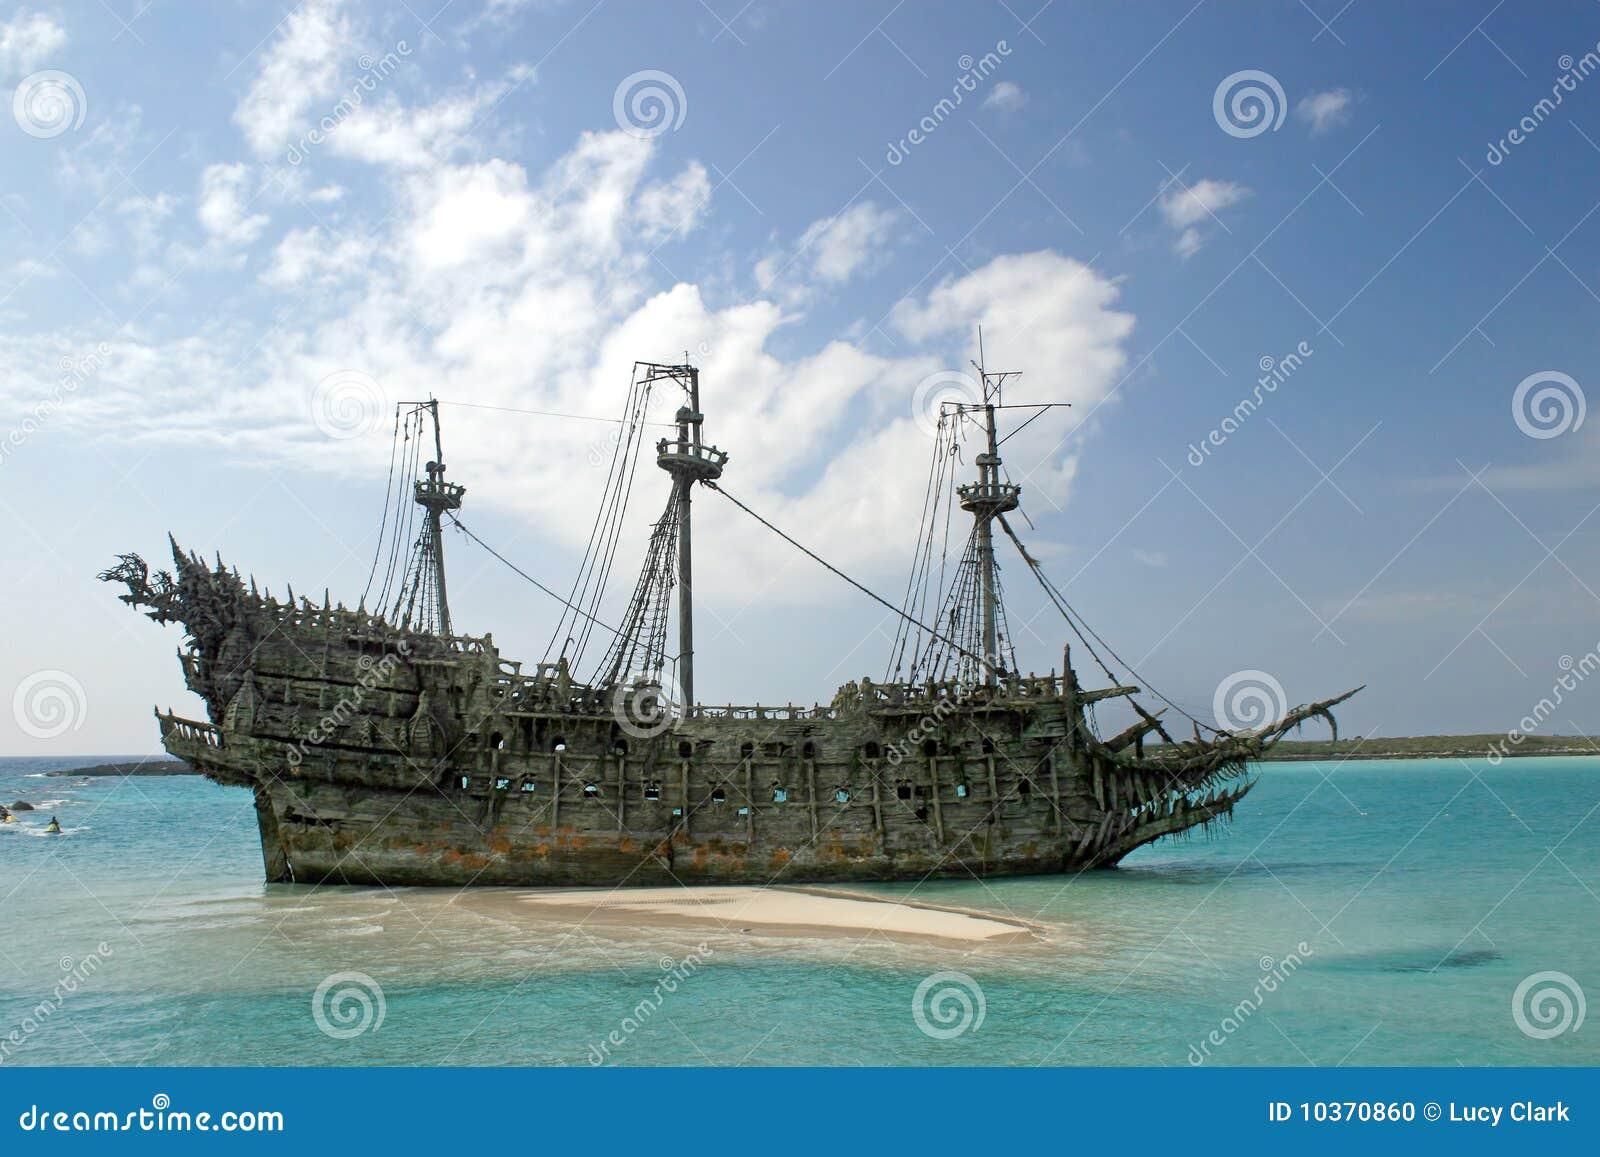 Bateau de pirate des cara bes photo stock image du - Image bateau pirate ...